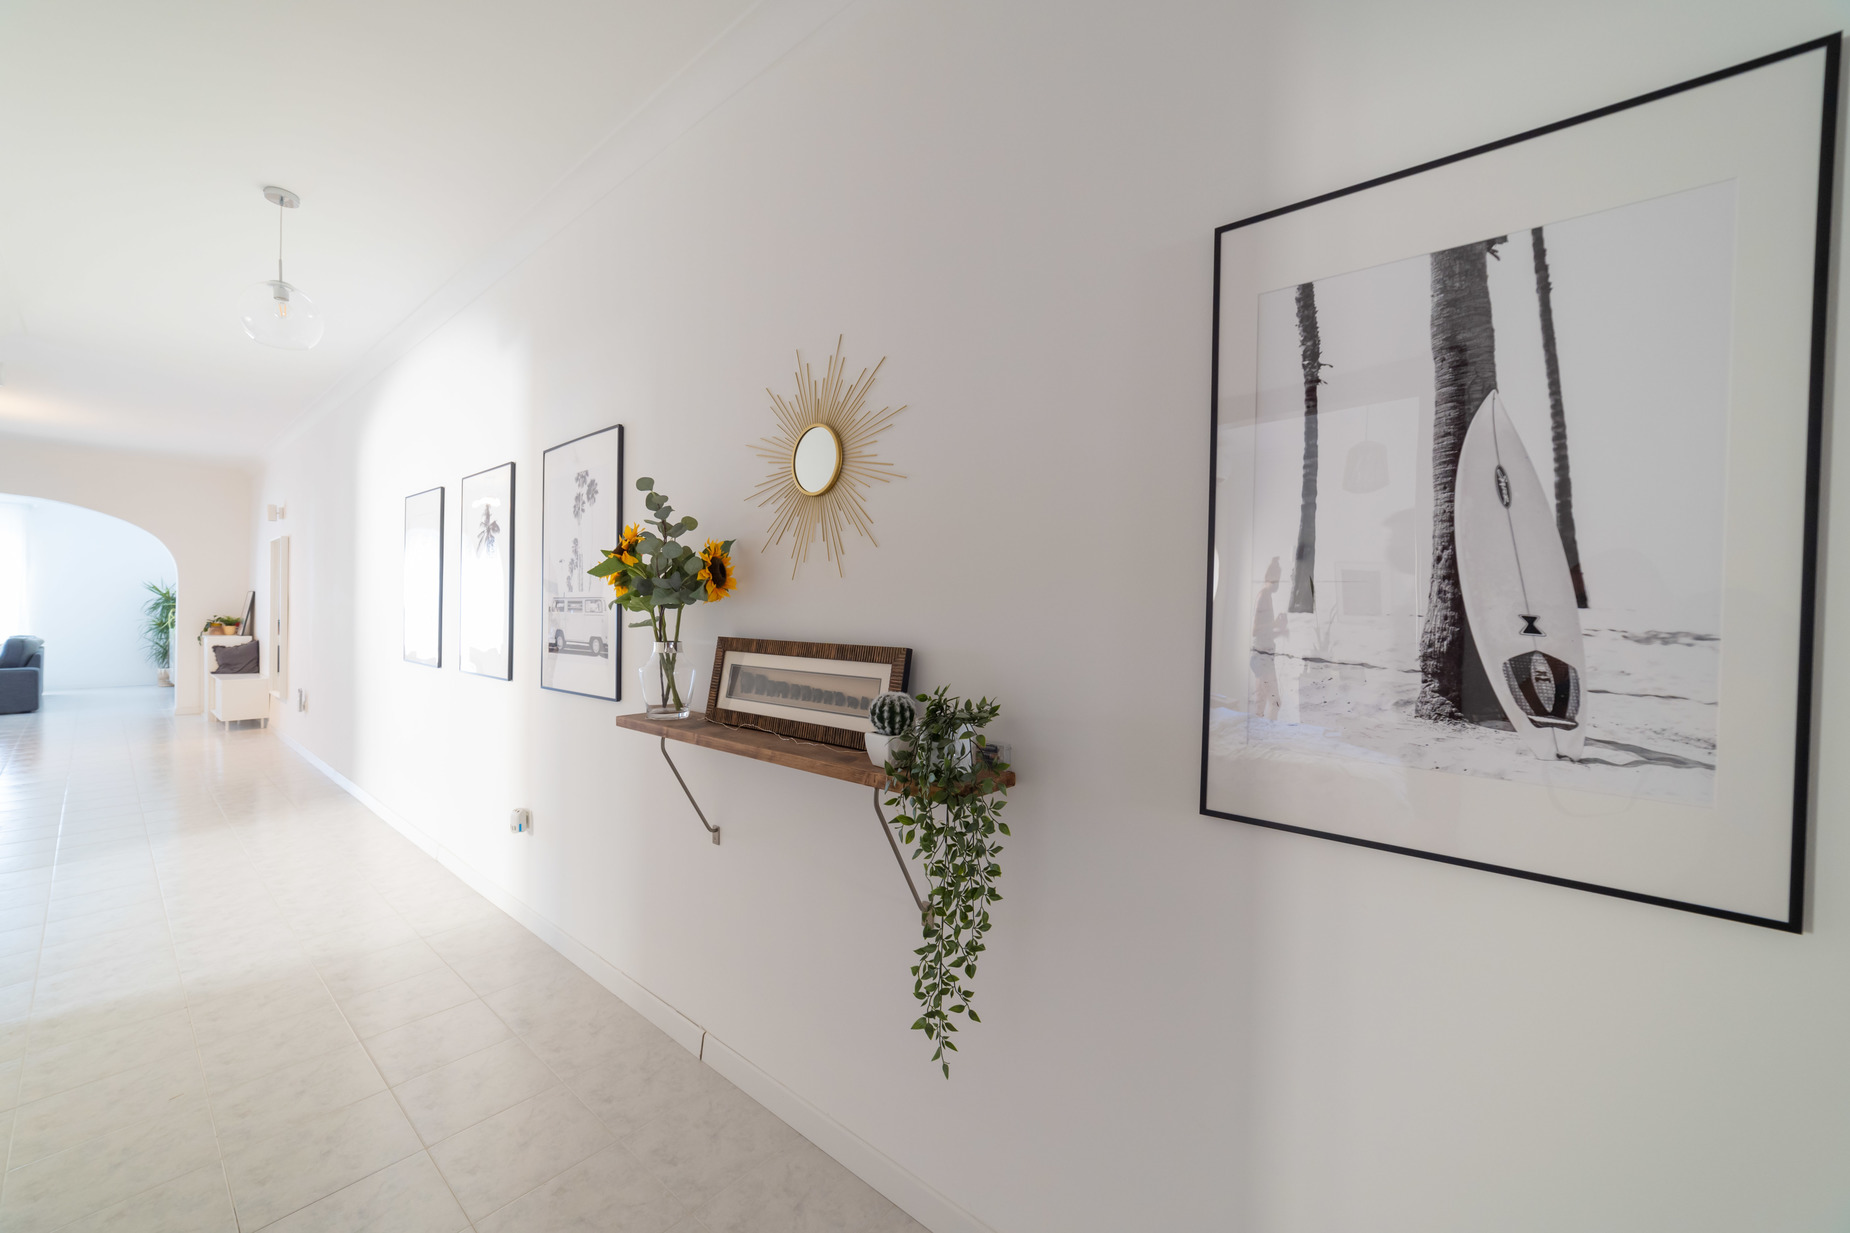 3 bed Apartment For Sale in Naxxar, Naxxar - thumb 9